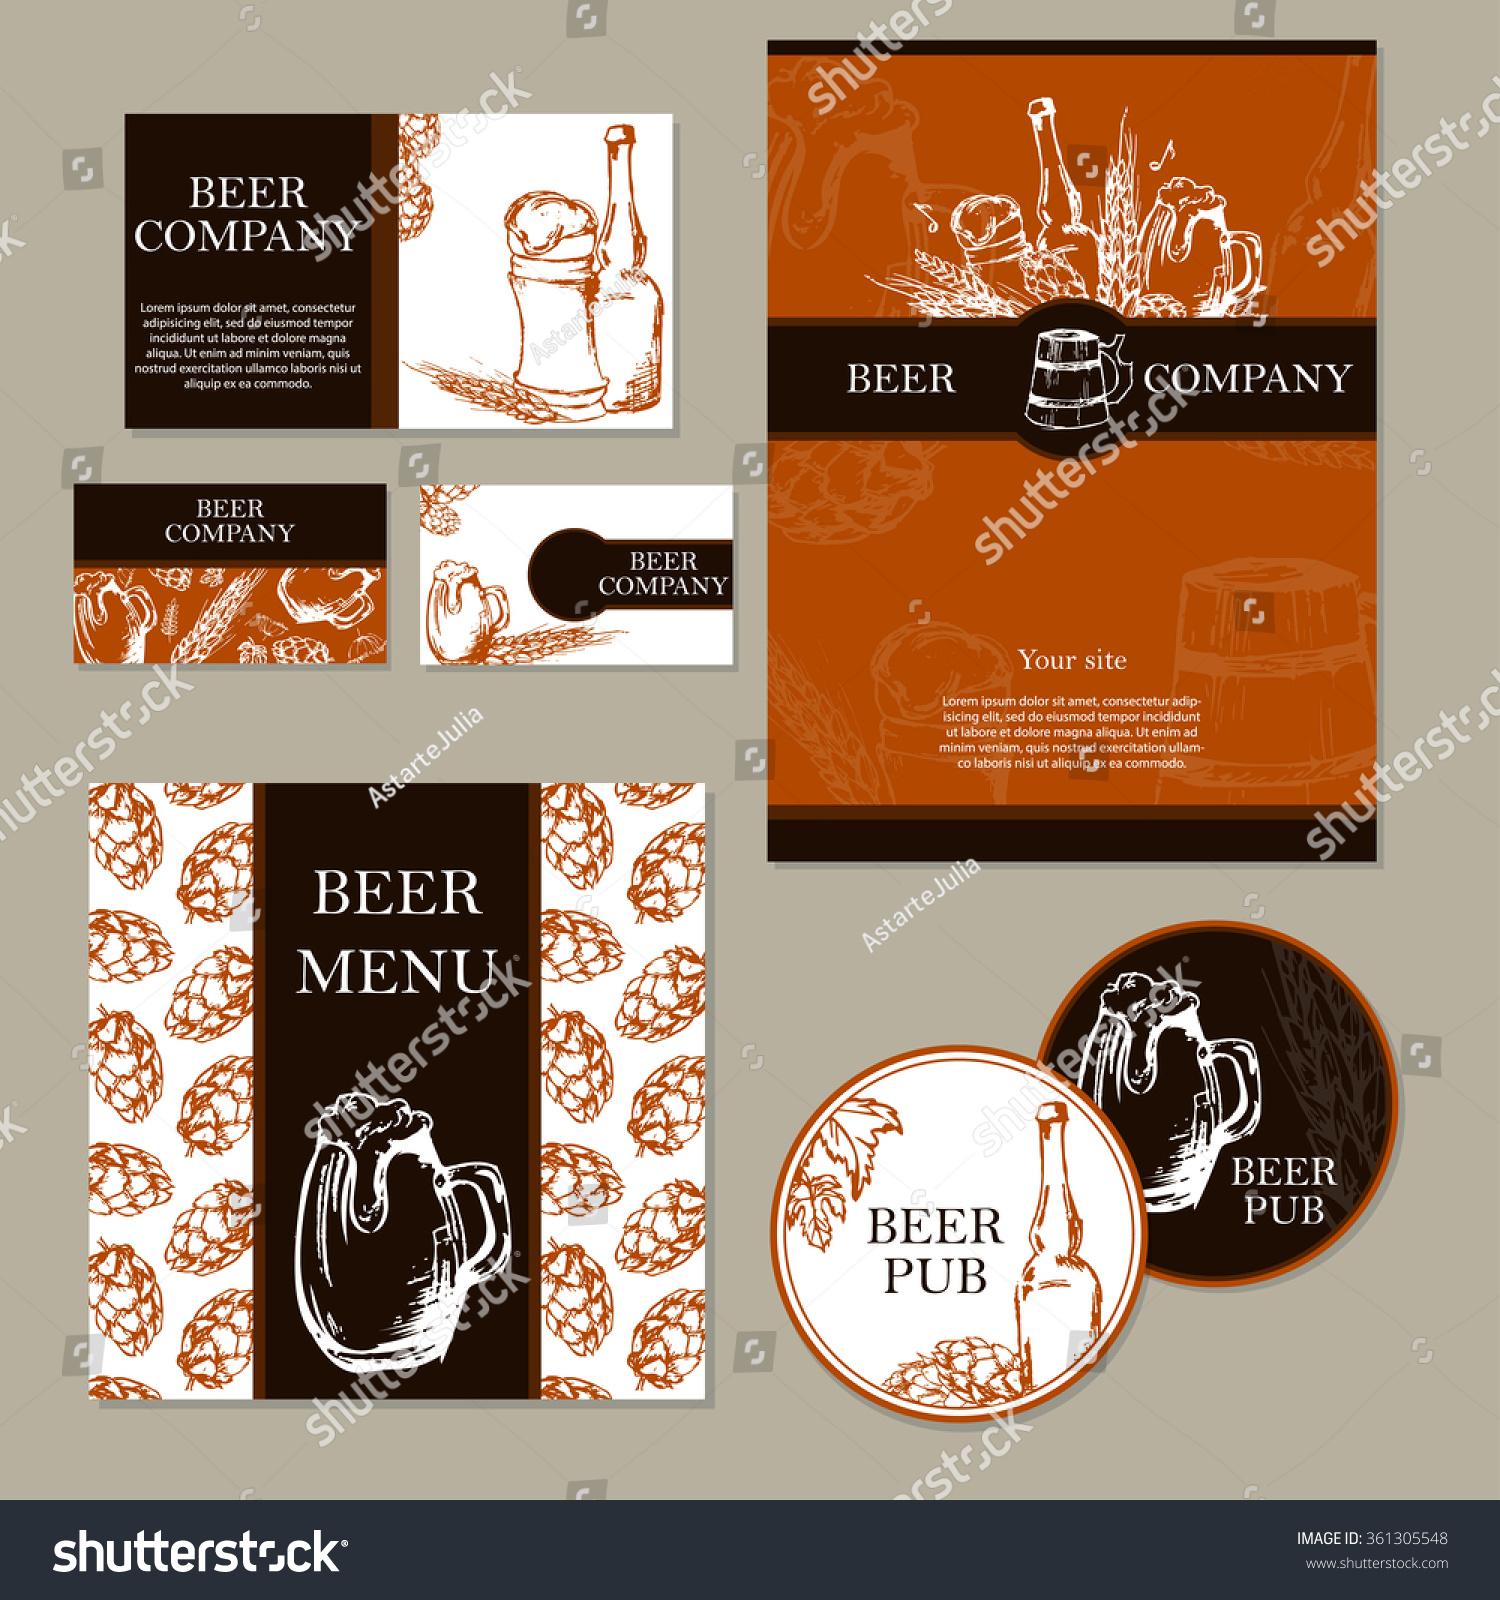 beer menu retro card flyer restaurant stock vector